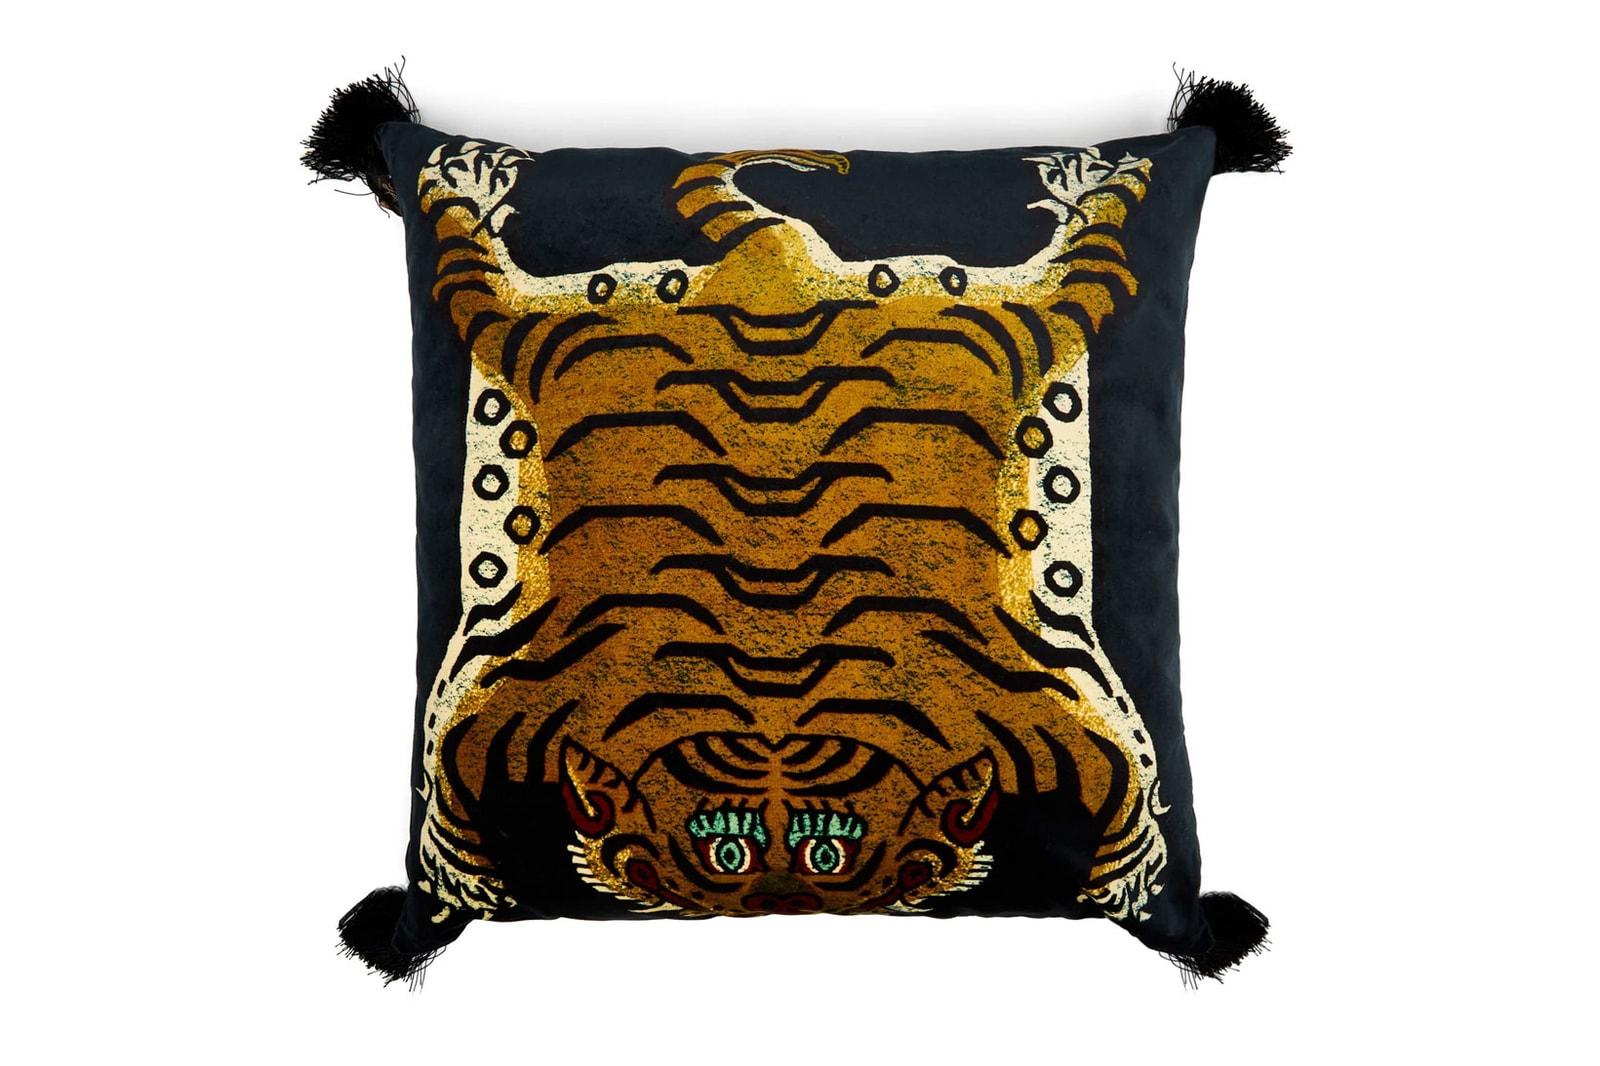 best designer homeware furniture kitchen living bedroom dishes vases gucci fornasetti fritz hansen brunello cucinelli zdg